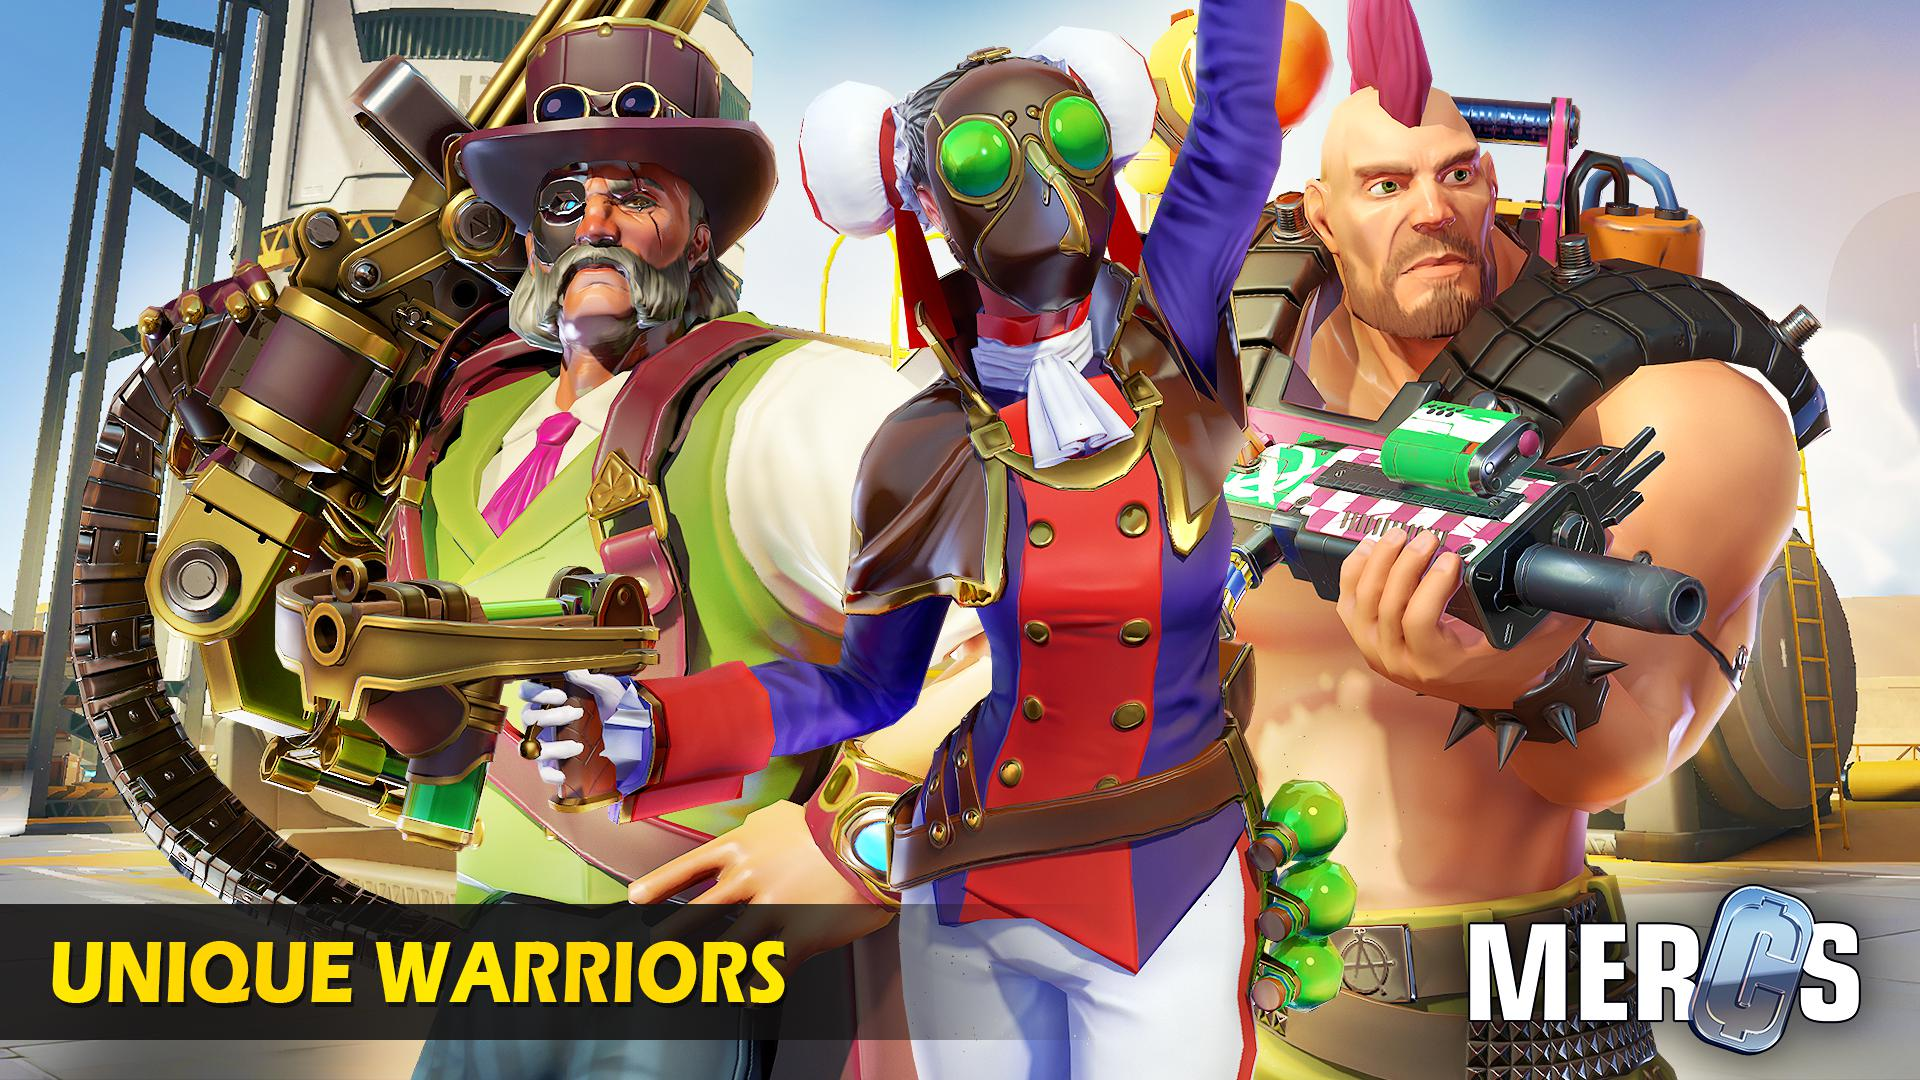 MERCS - Cyber strike arena. Multiplayer shooter! 游戏截图3